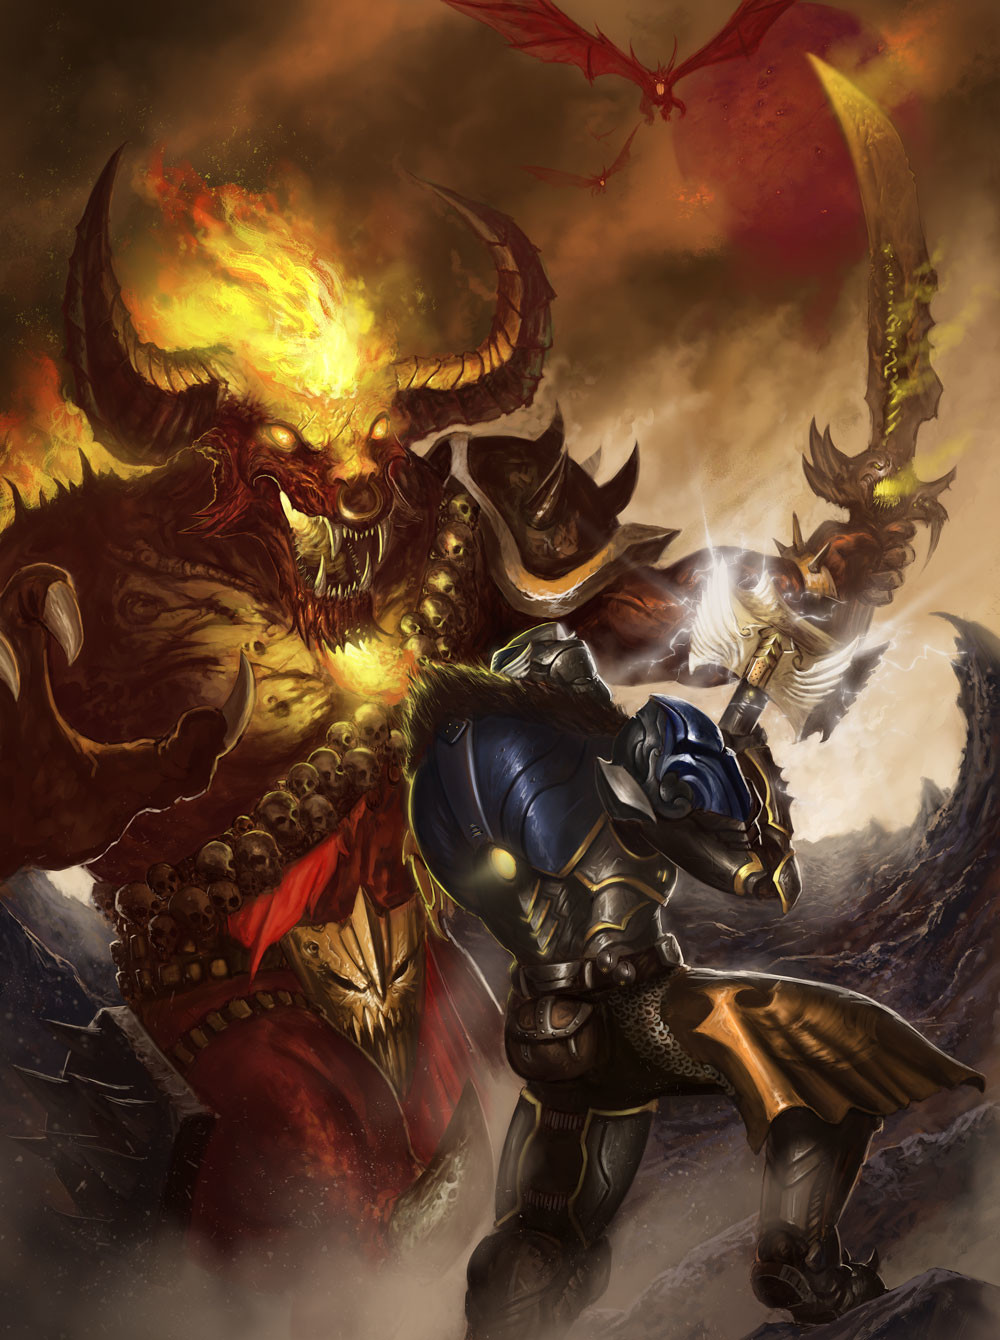 Michael rookard alexandros v blackmetallord f2